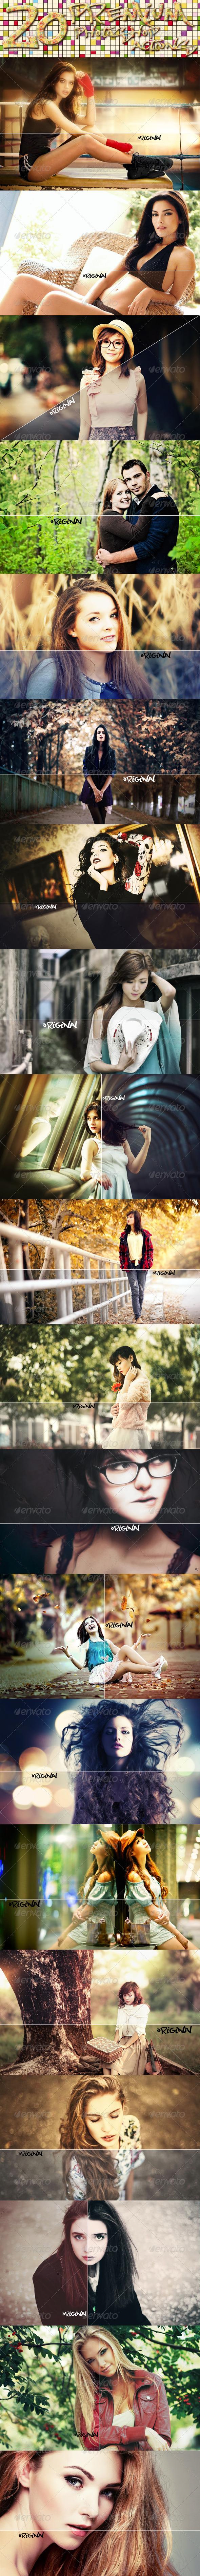 GraphicRiver 20 Premium Photoshop Actions 8681841